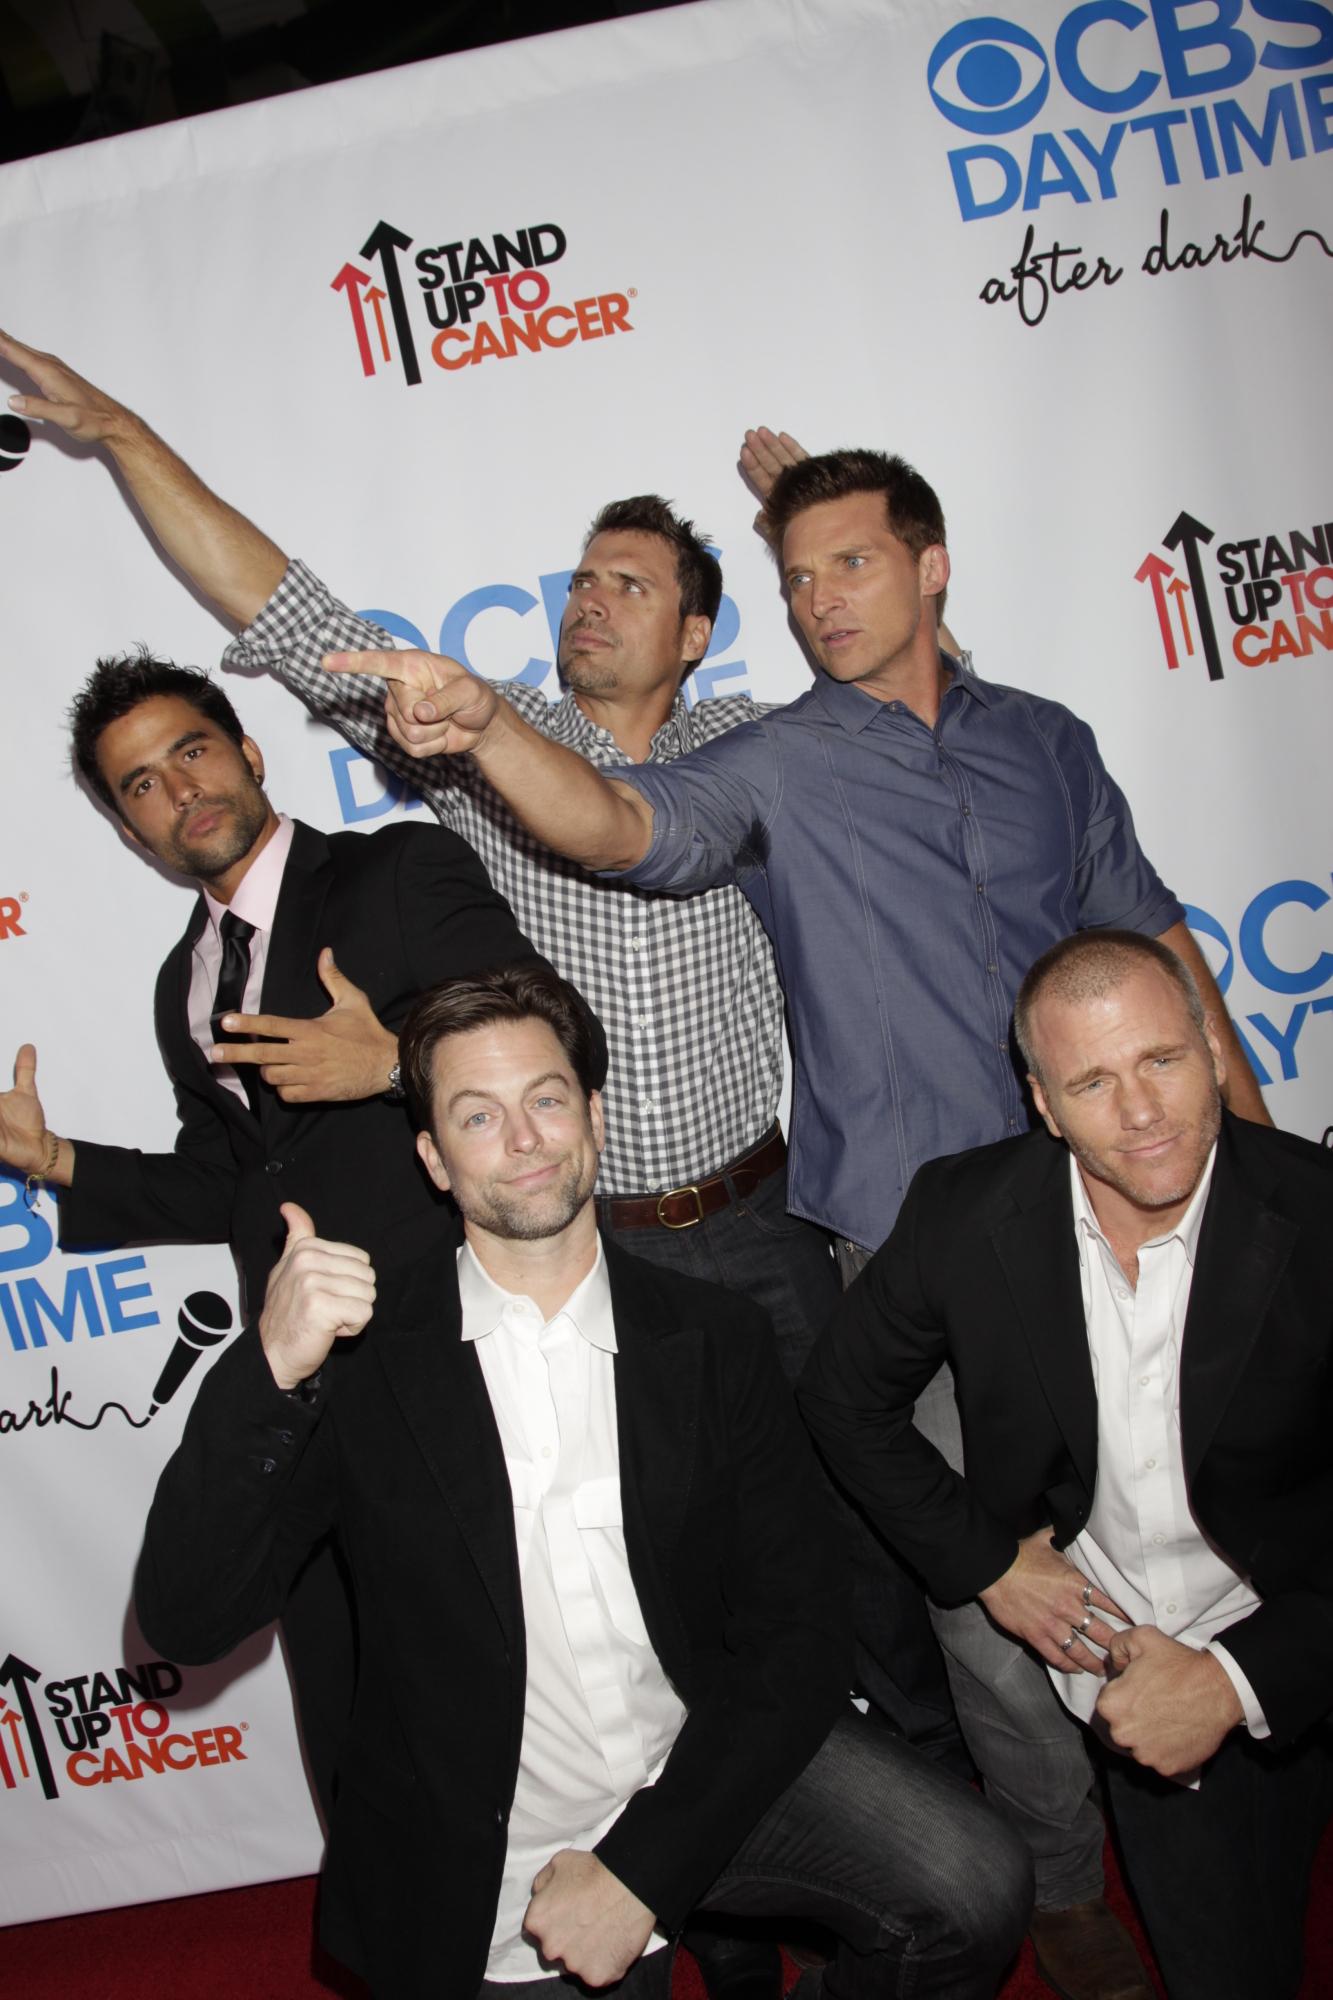 Ignacio, Joshua, Steve, Michael, and Sean